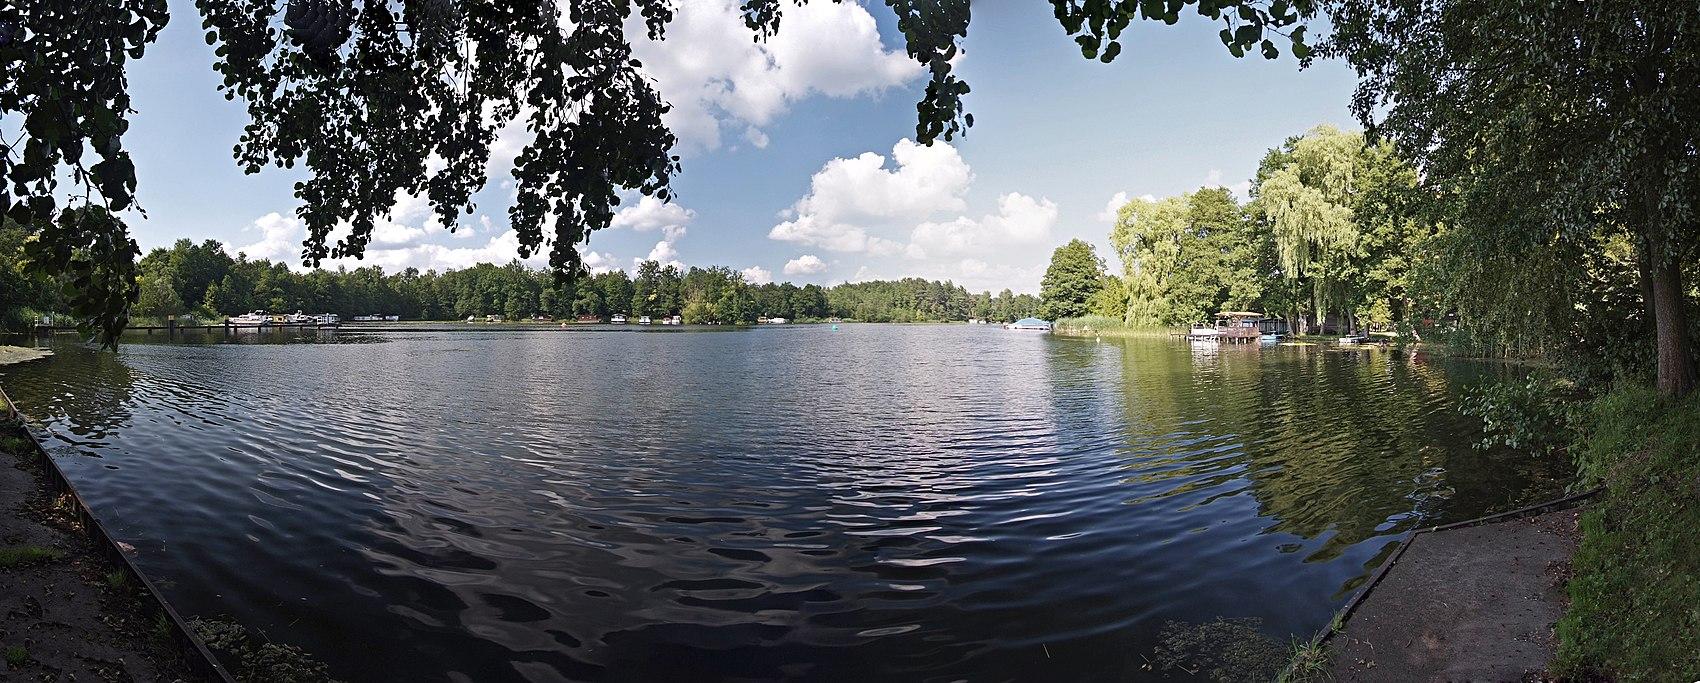 Werbellinkanal Panorama.jpg